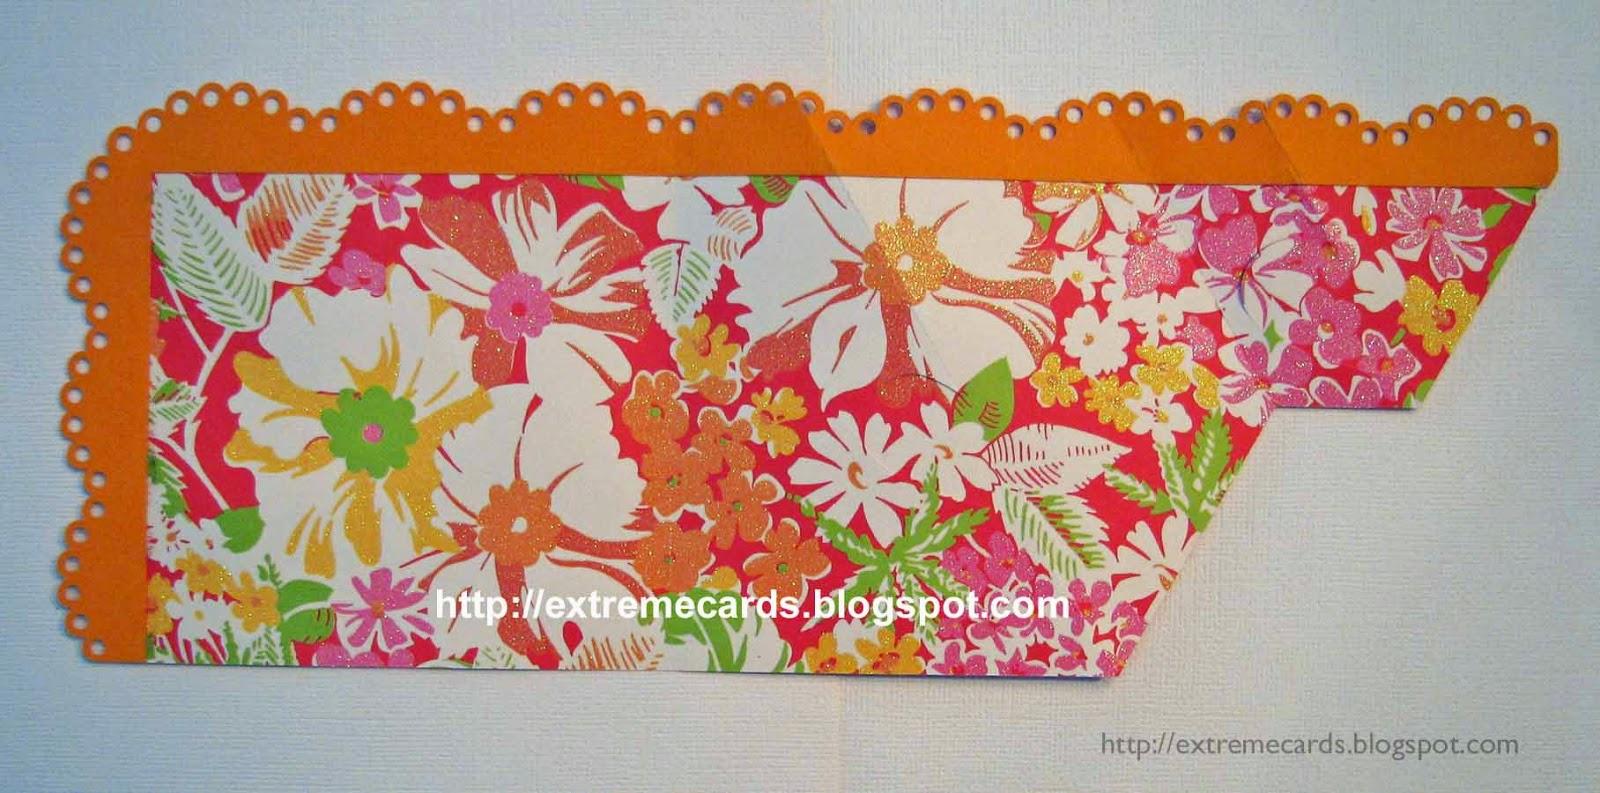 cut base card and adhere lace